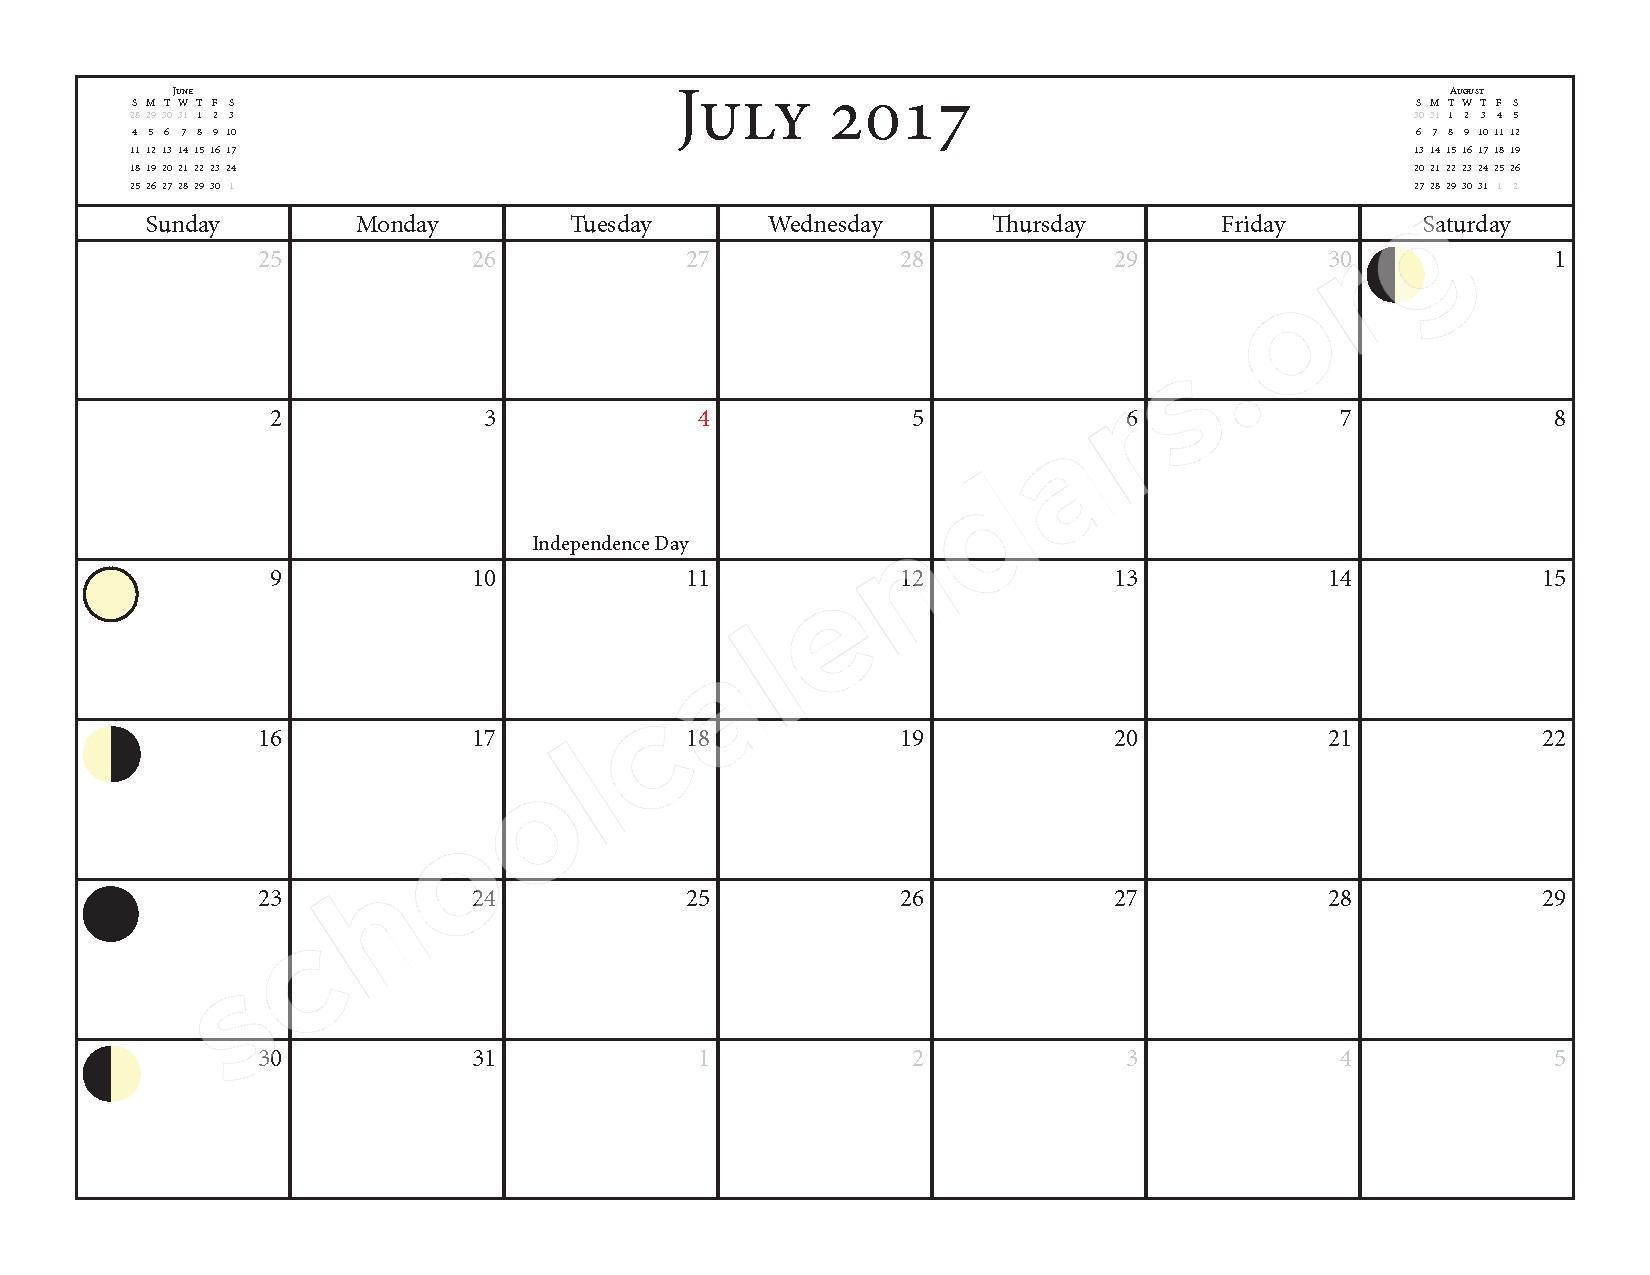 2016 - 2017 School Calendar – Salmon River Central School District – page 23